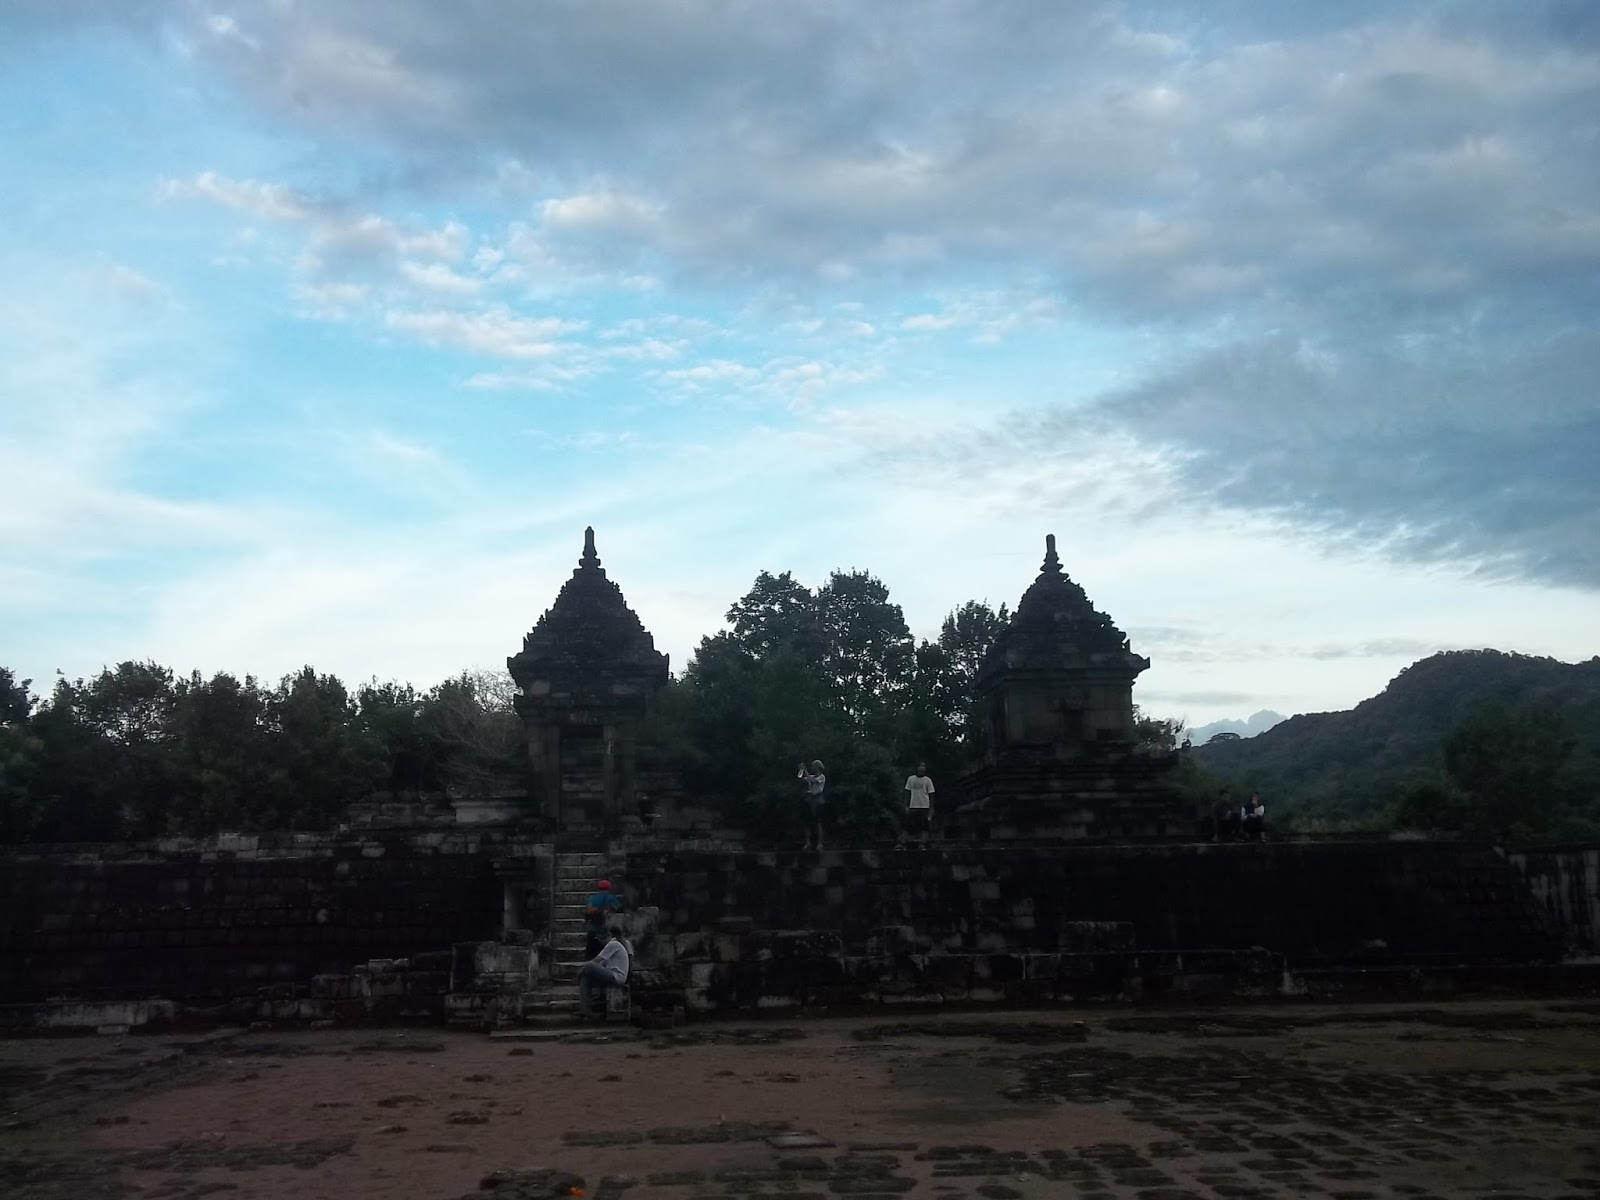 Journey Story Selamat Sore Candi Barong Jalan Masuk Wilayah Yogyakarta